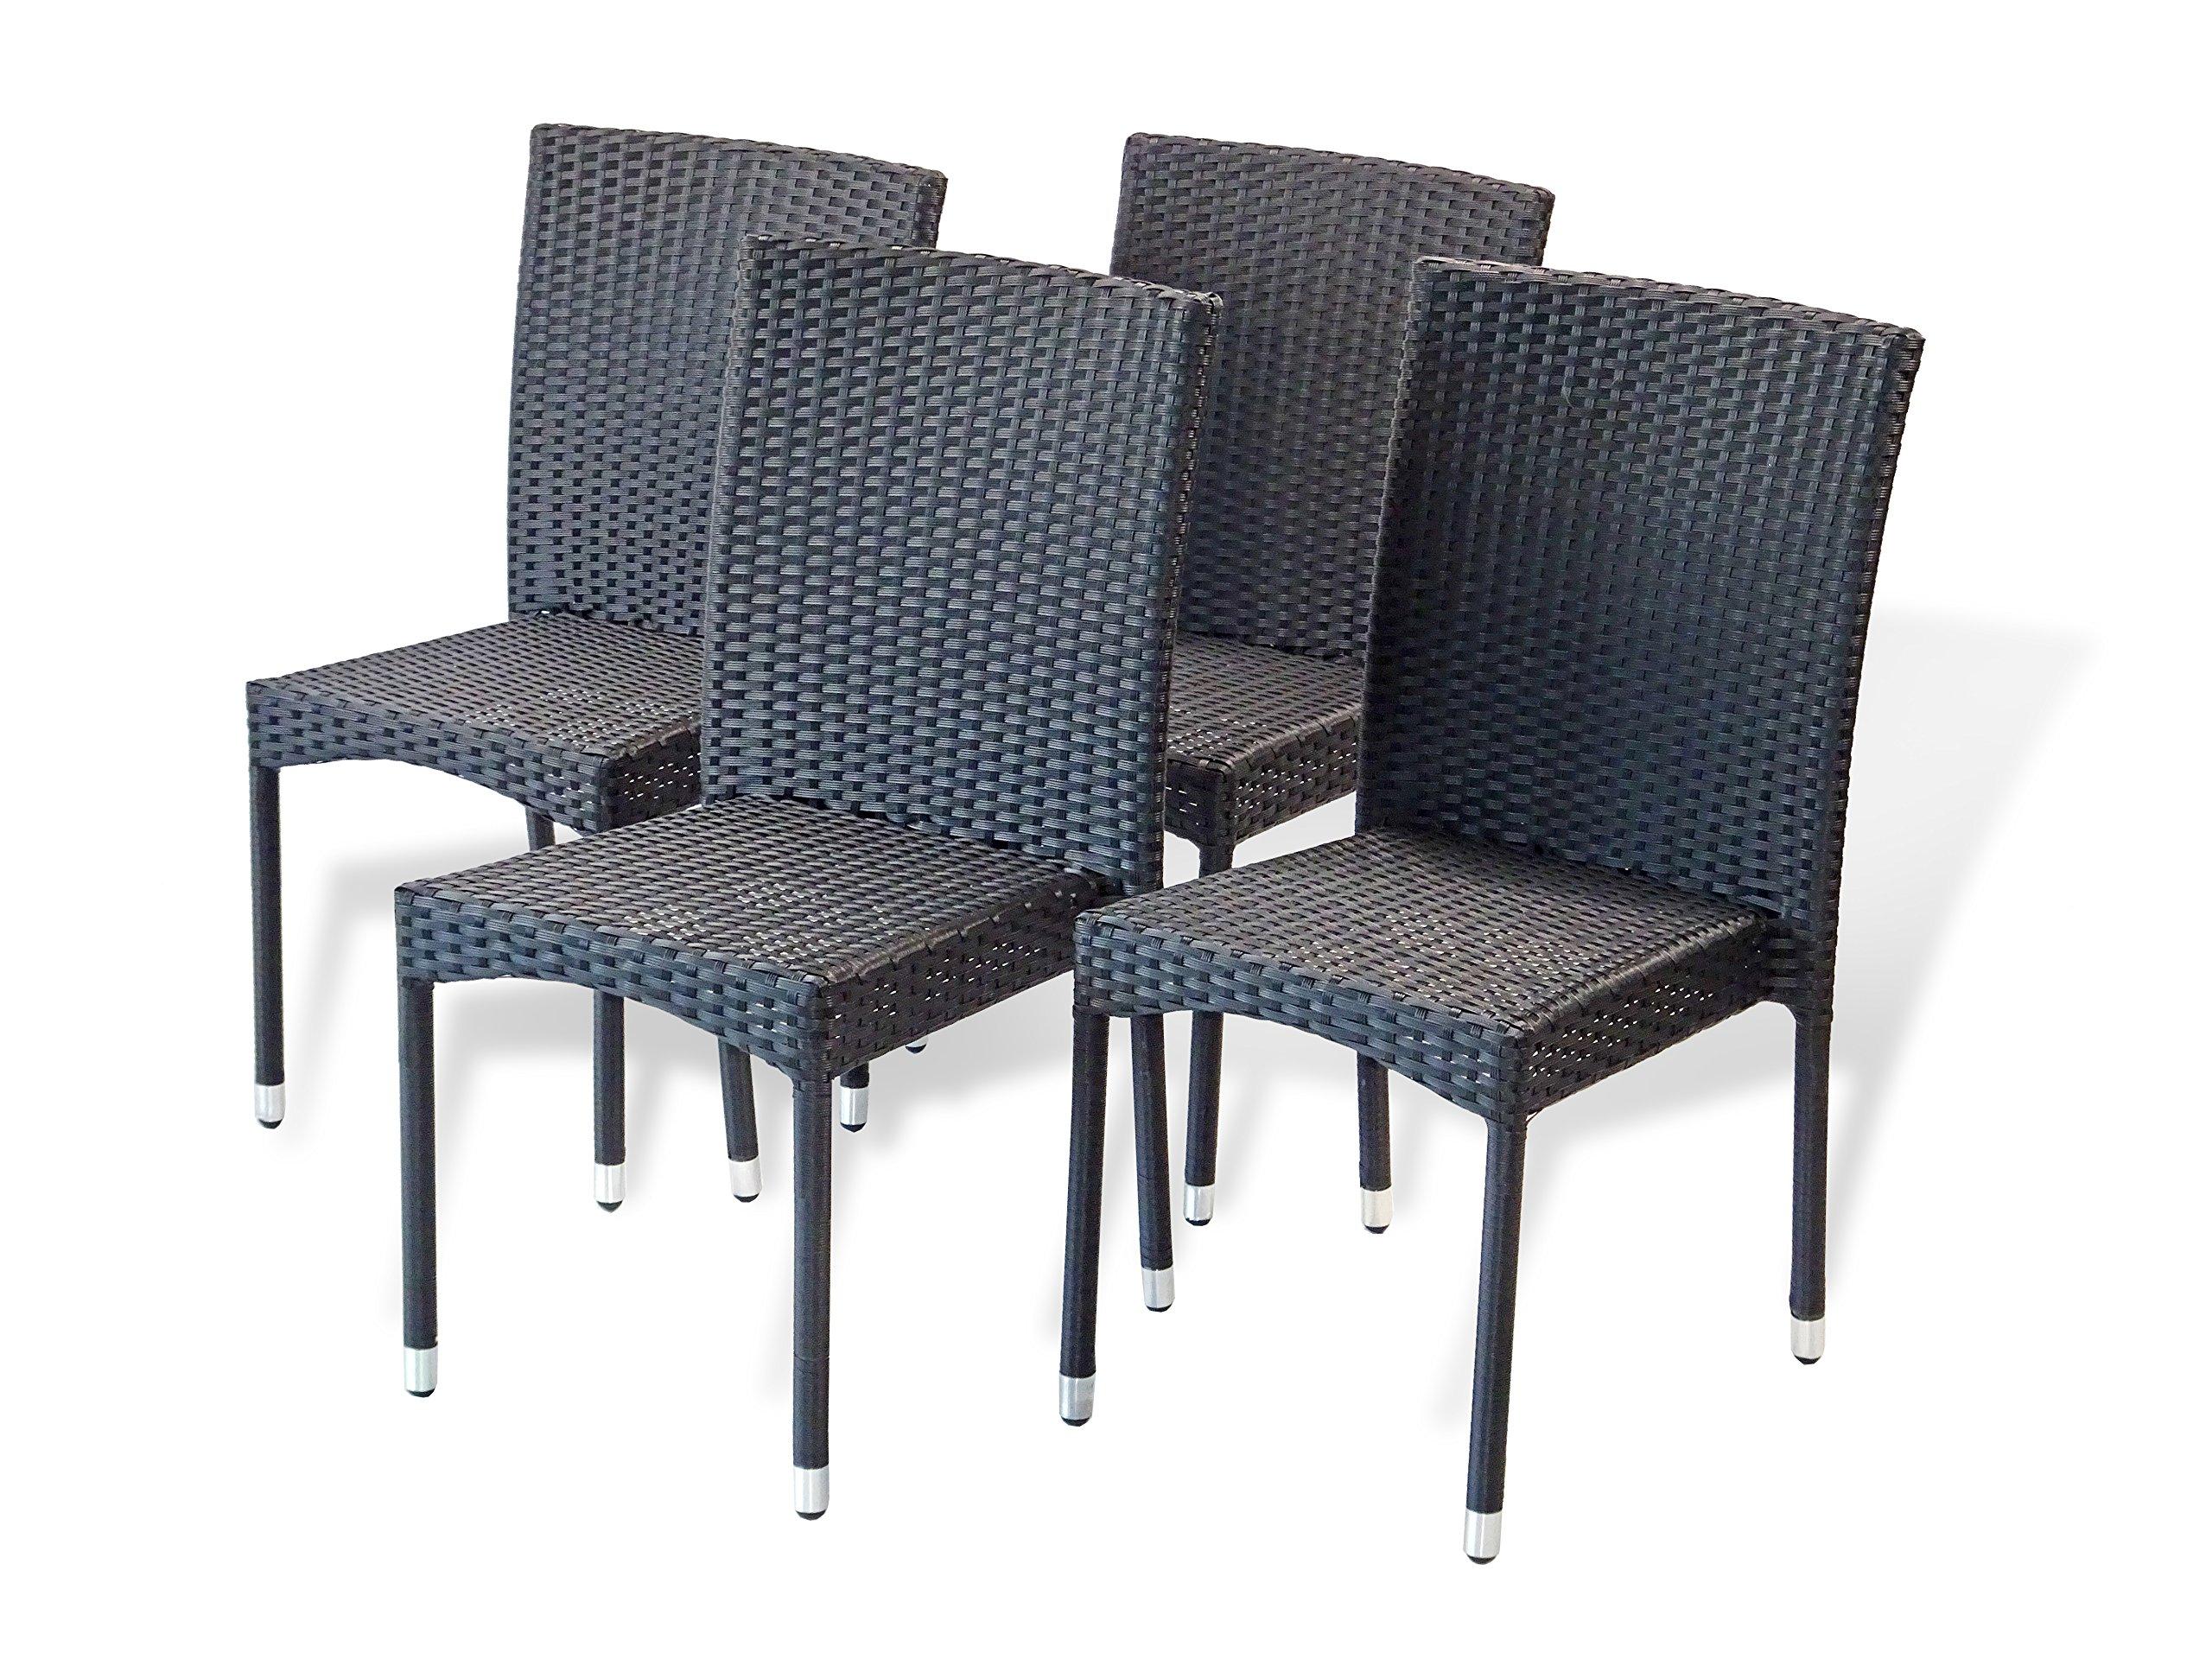 Patio Resin Outdoor Garden Yard Wicker Side Chair. Black Color (Set of 4)